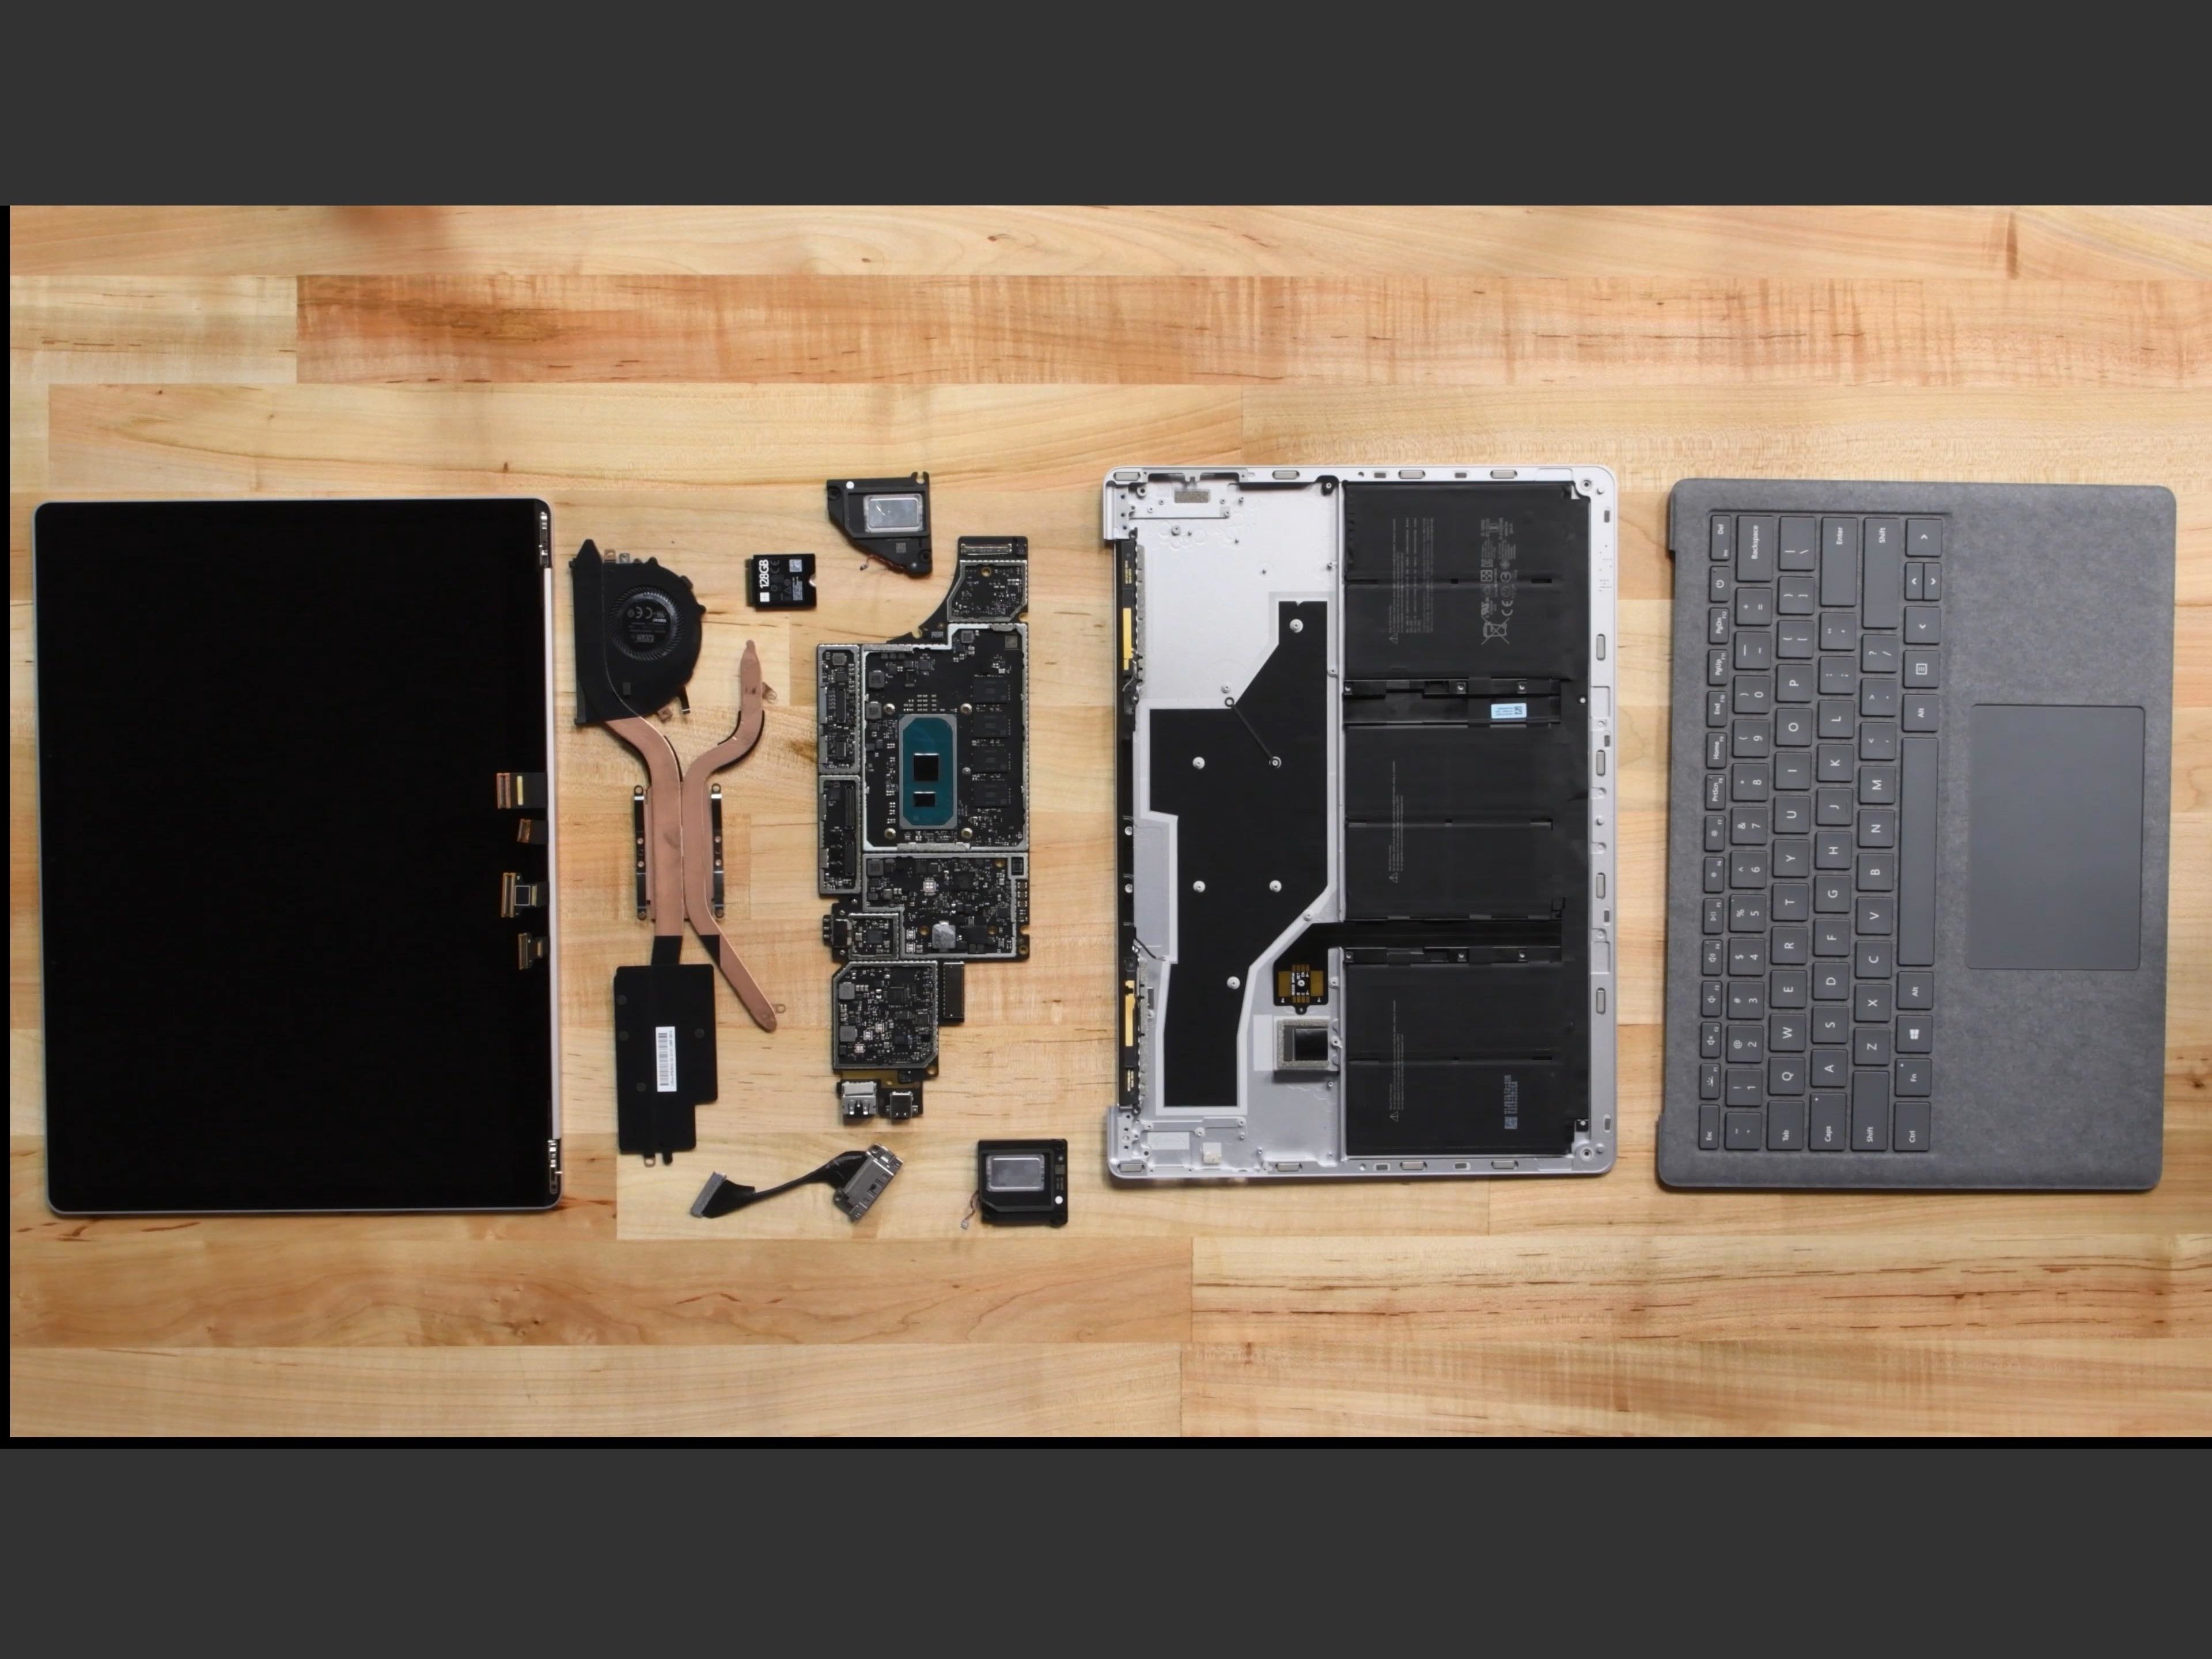 Microsoft Surface Laptop 3 (13.5-inch) Teardown